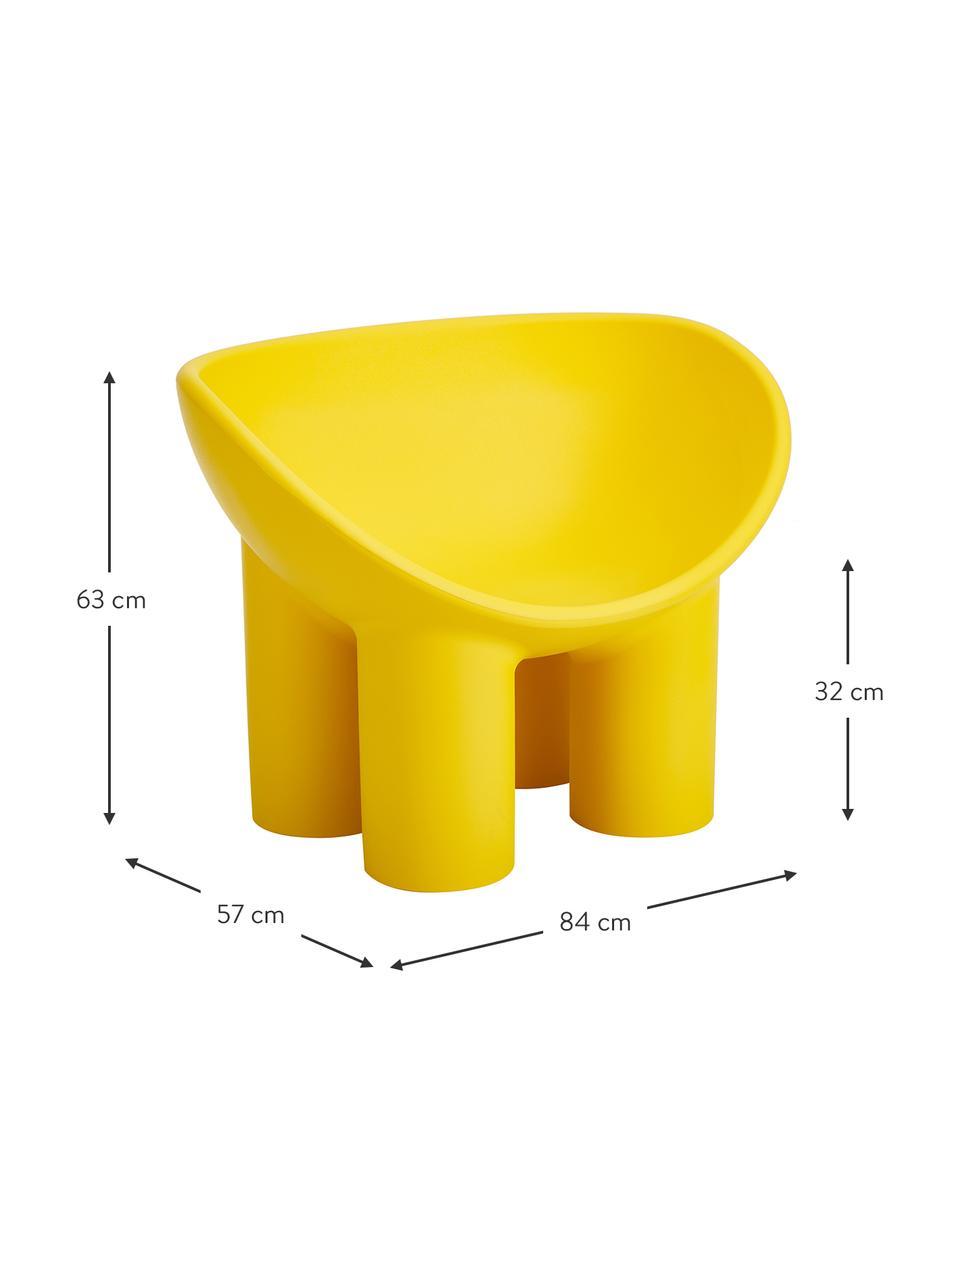 Designer Sessel Roly Poly in Ockergelb, Polyethylen, im Rotationsgussverfahren hergestellt, Ockergelb, B 84 x T 57 cm